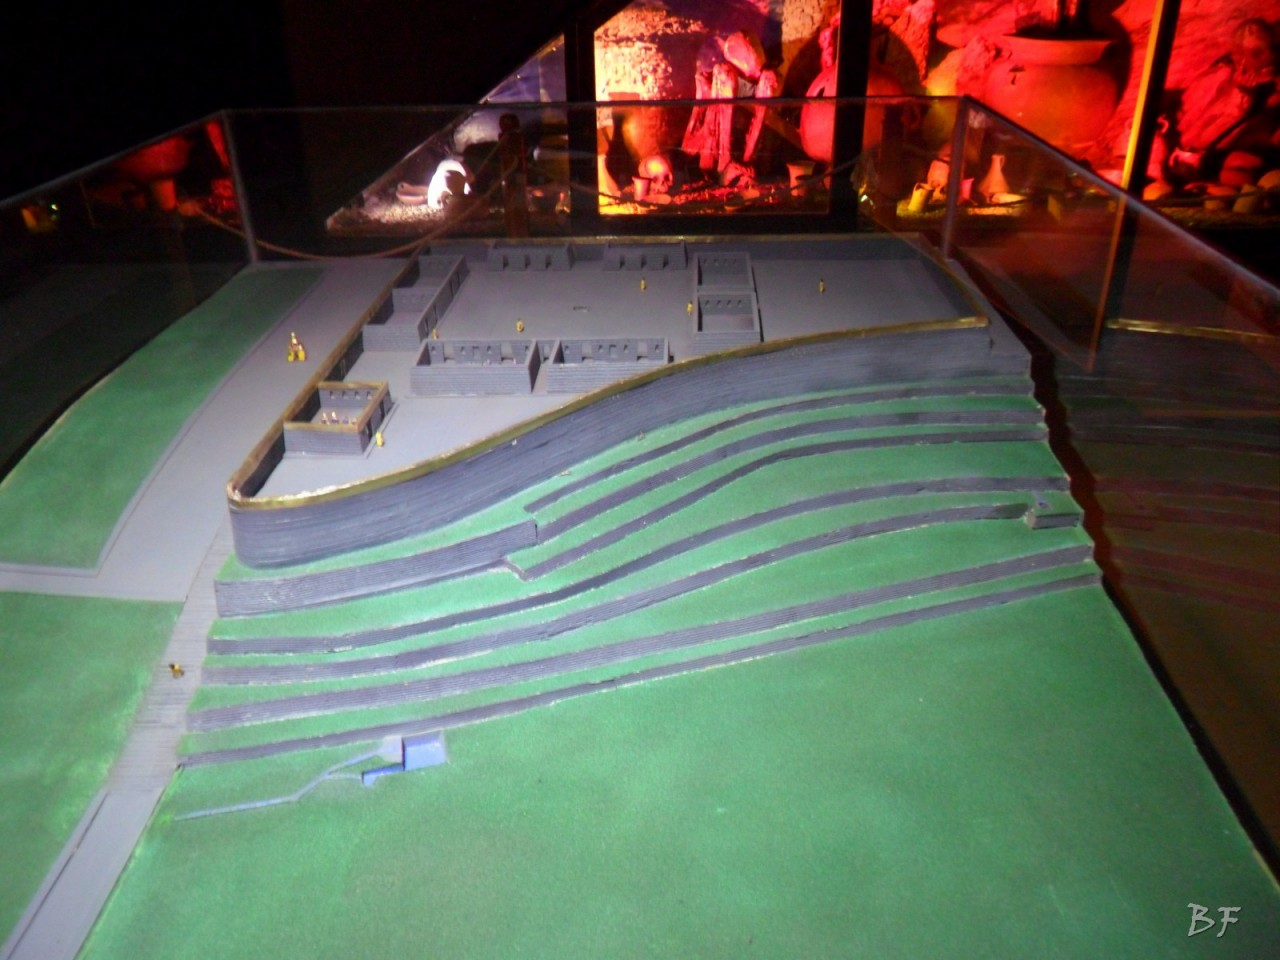 Mura-Poligonali-Megaliti-Tempio-Coricancha-Cusco-Perù-14